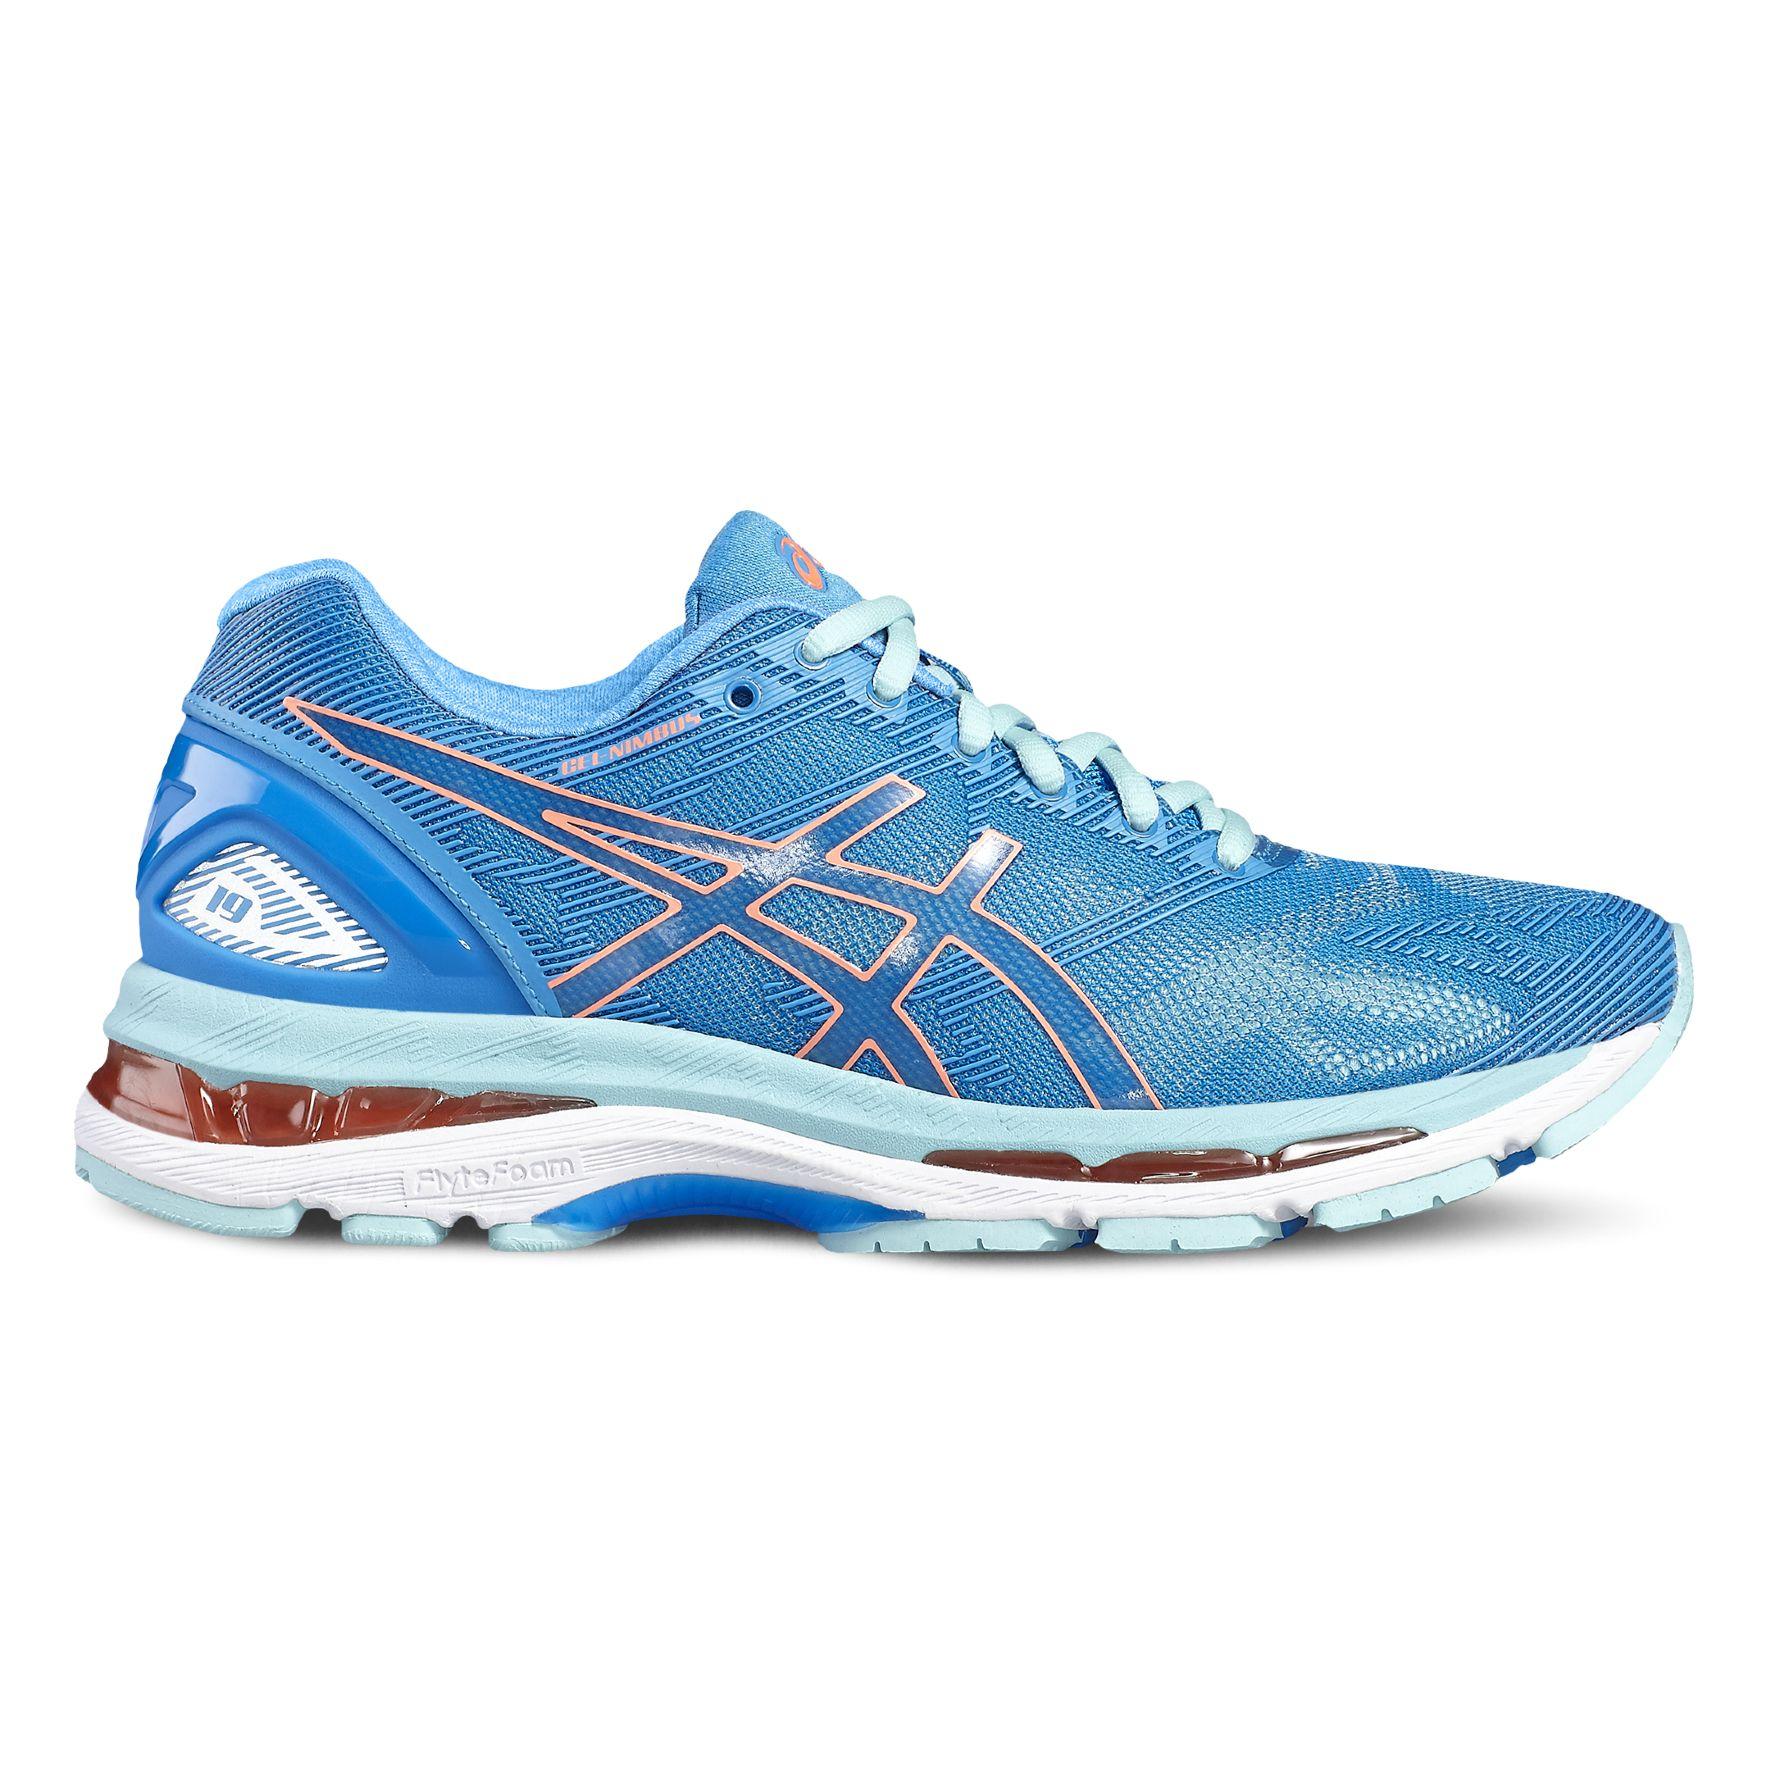 Are Asics Gel Nimbus Good Running Shoes